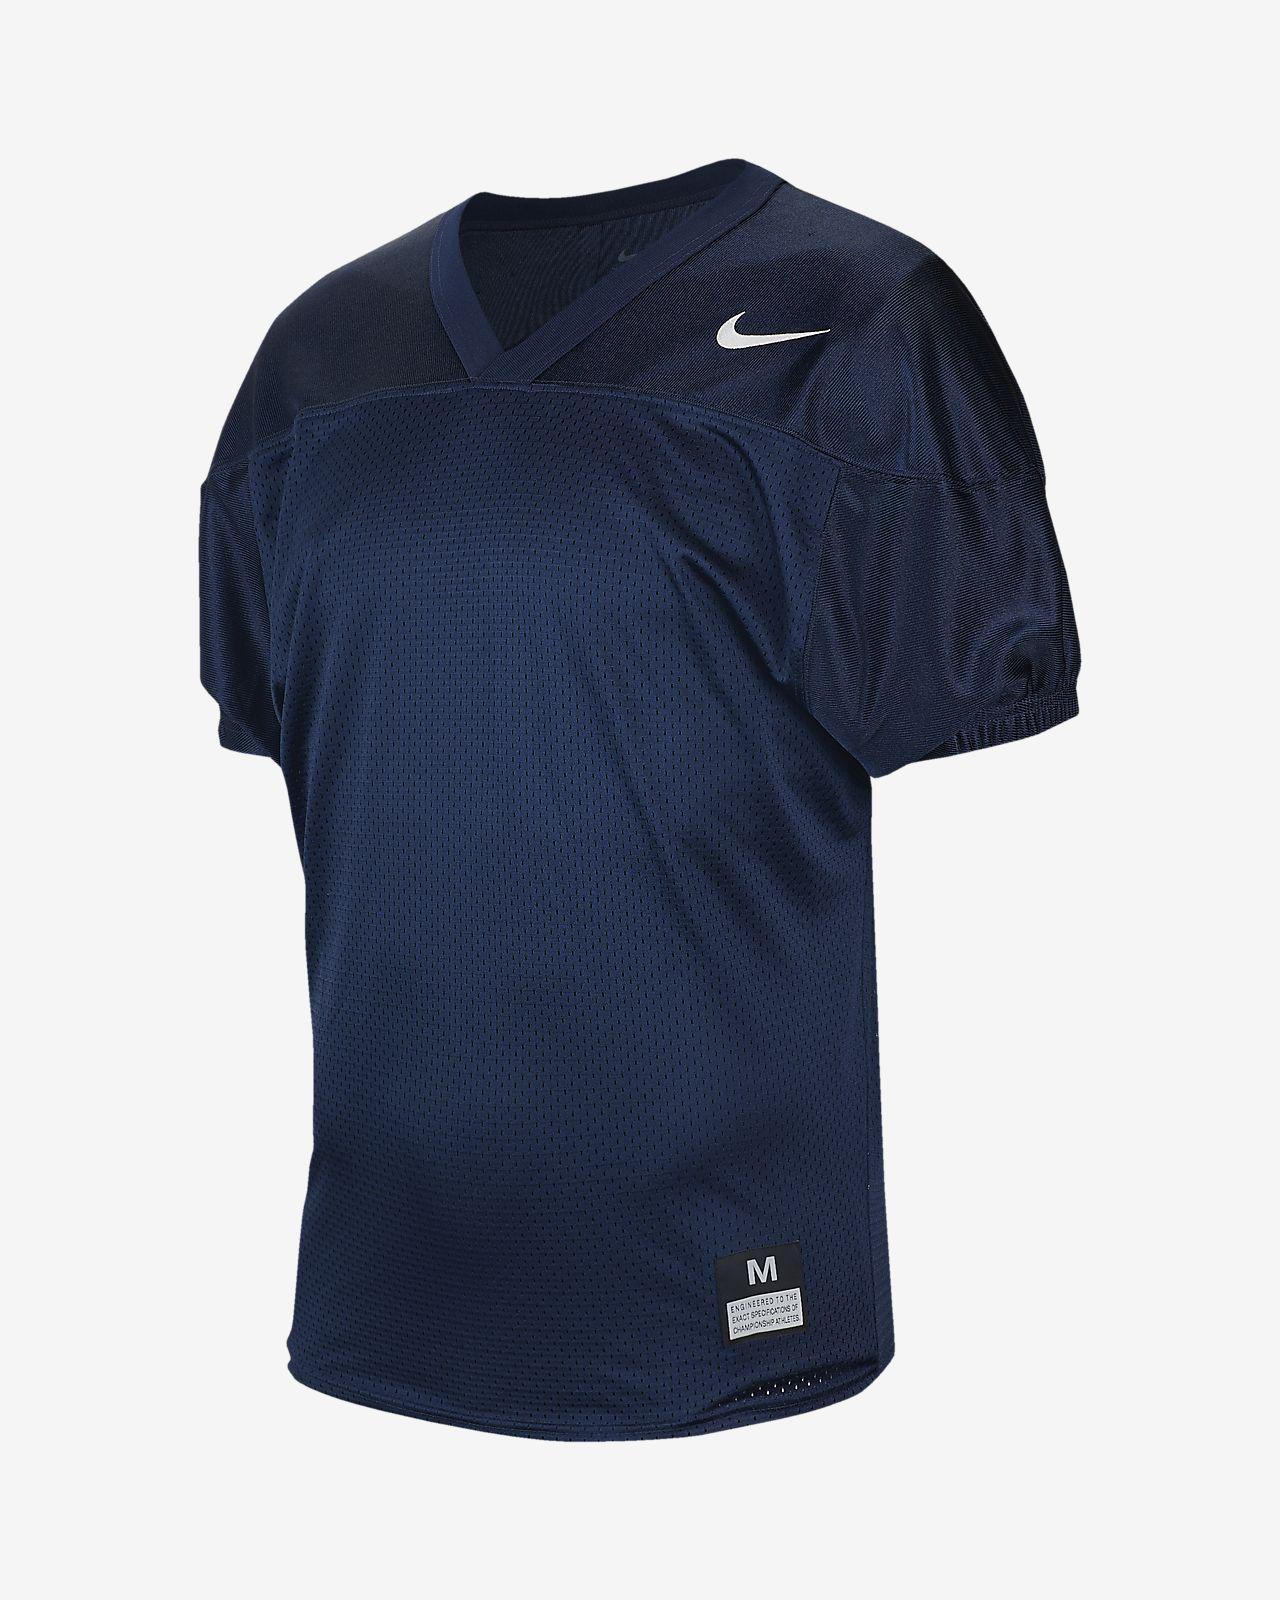 c48a72a6fb4 Nike Practice Men's Football Jersey. Nike.com